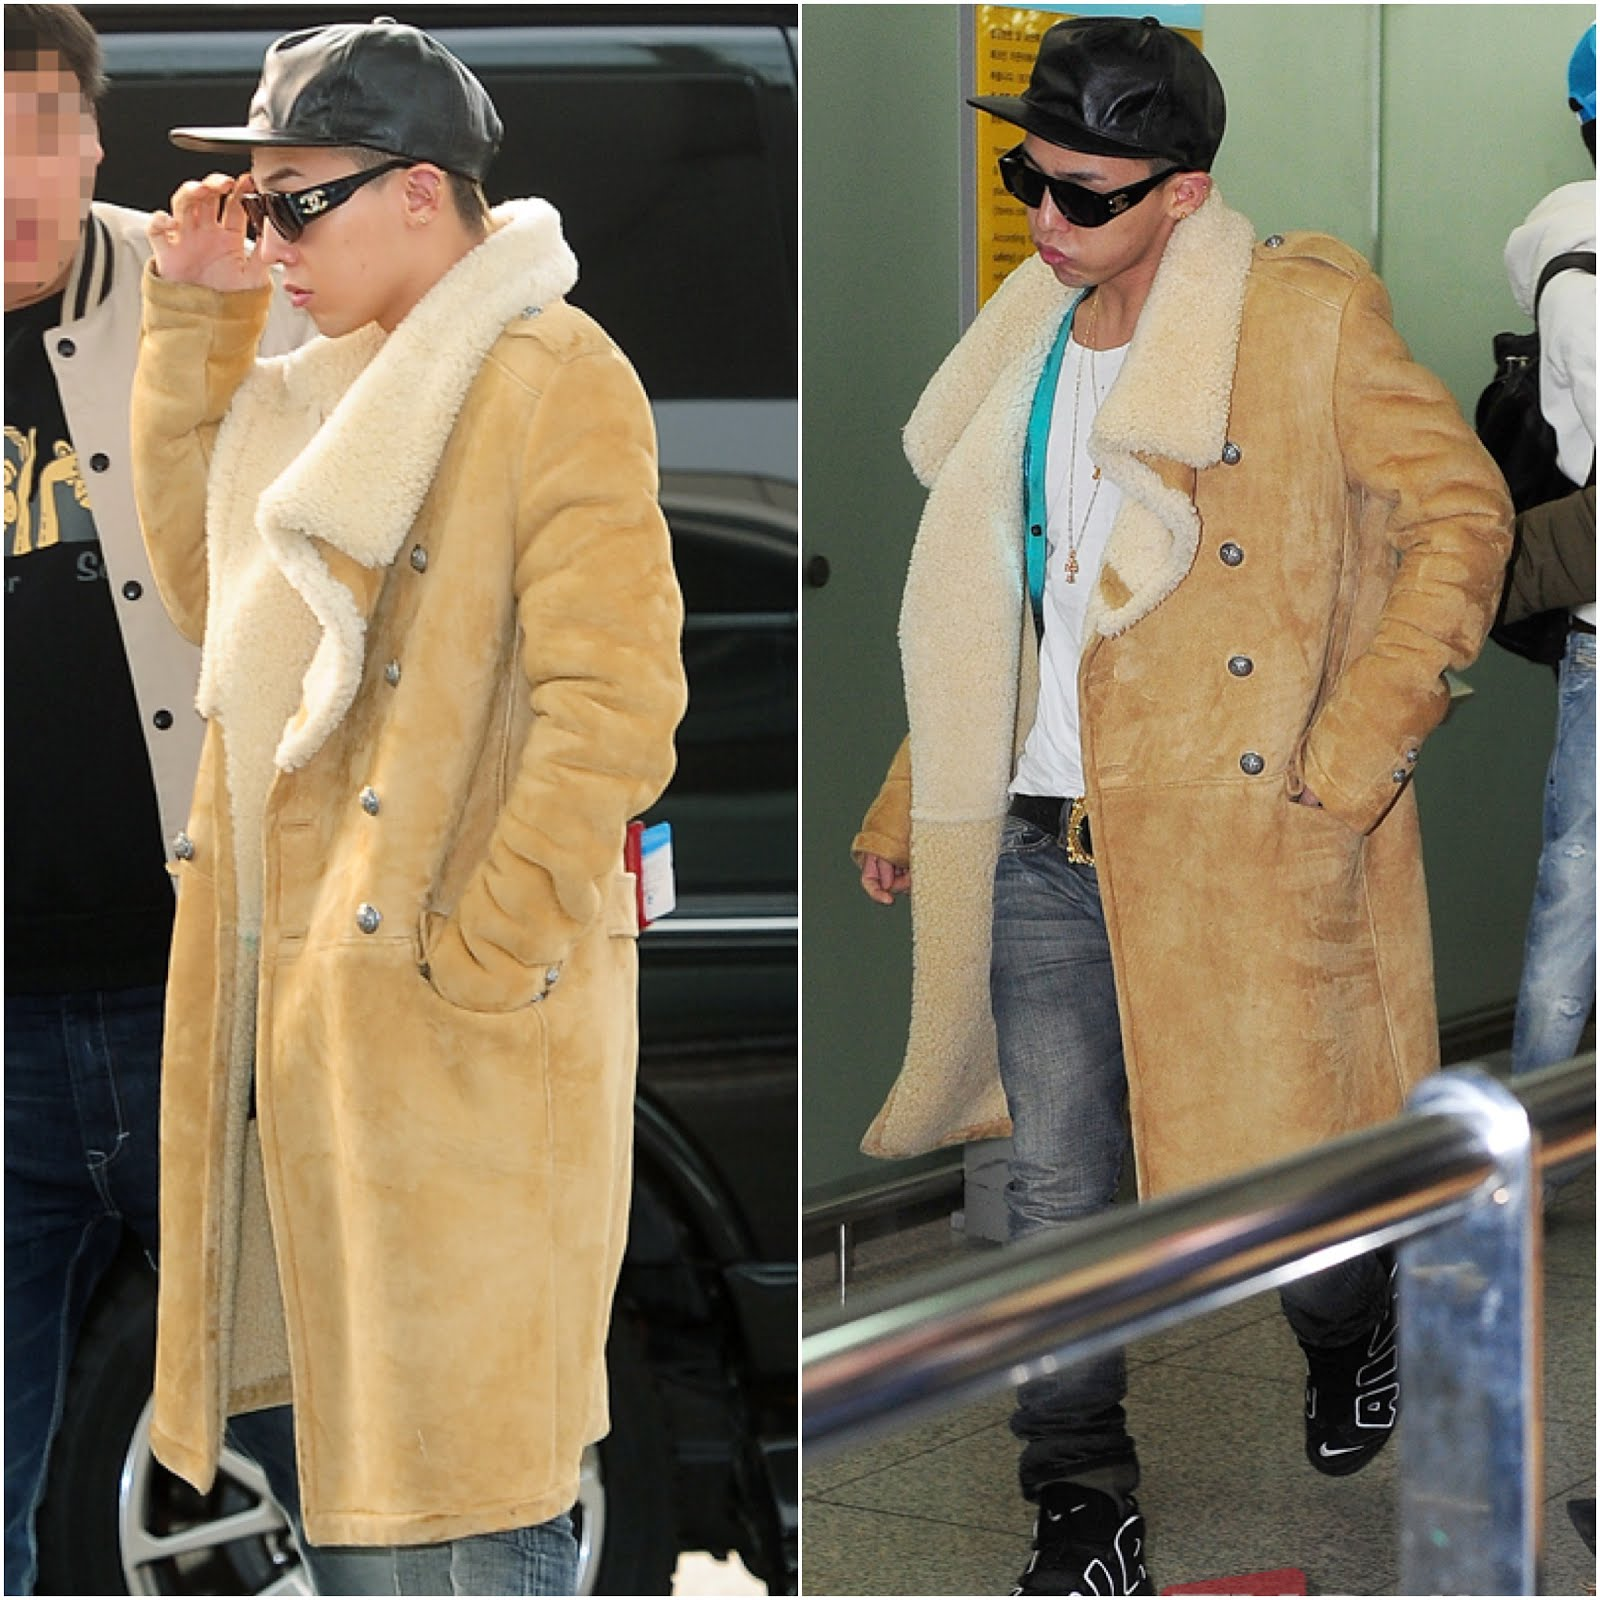 00O00 London Menswear Blog Celebrity Style G-Dragon [지드래곤] from BigBang in Balmain - Incheon Airport